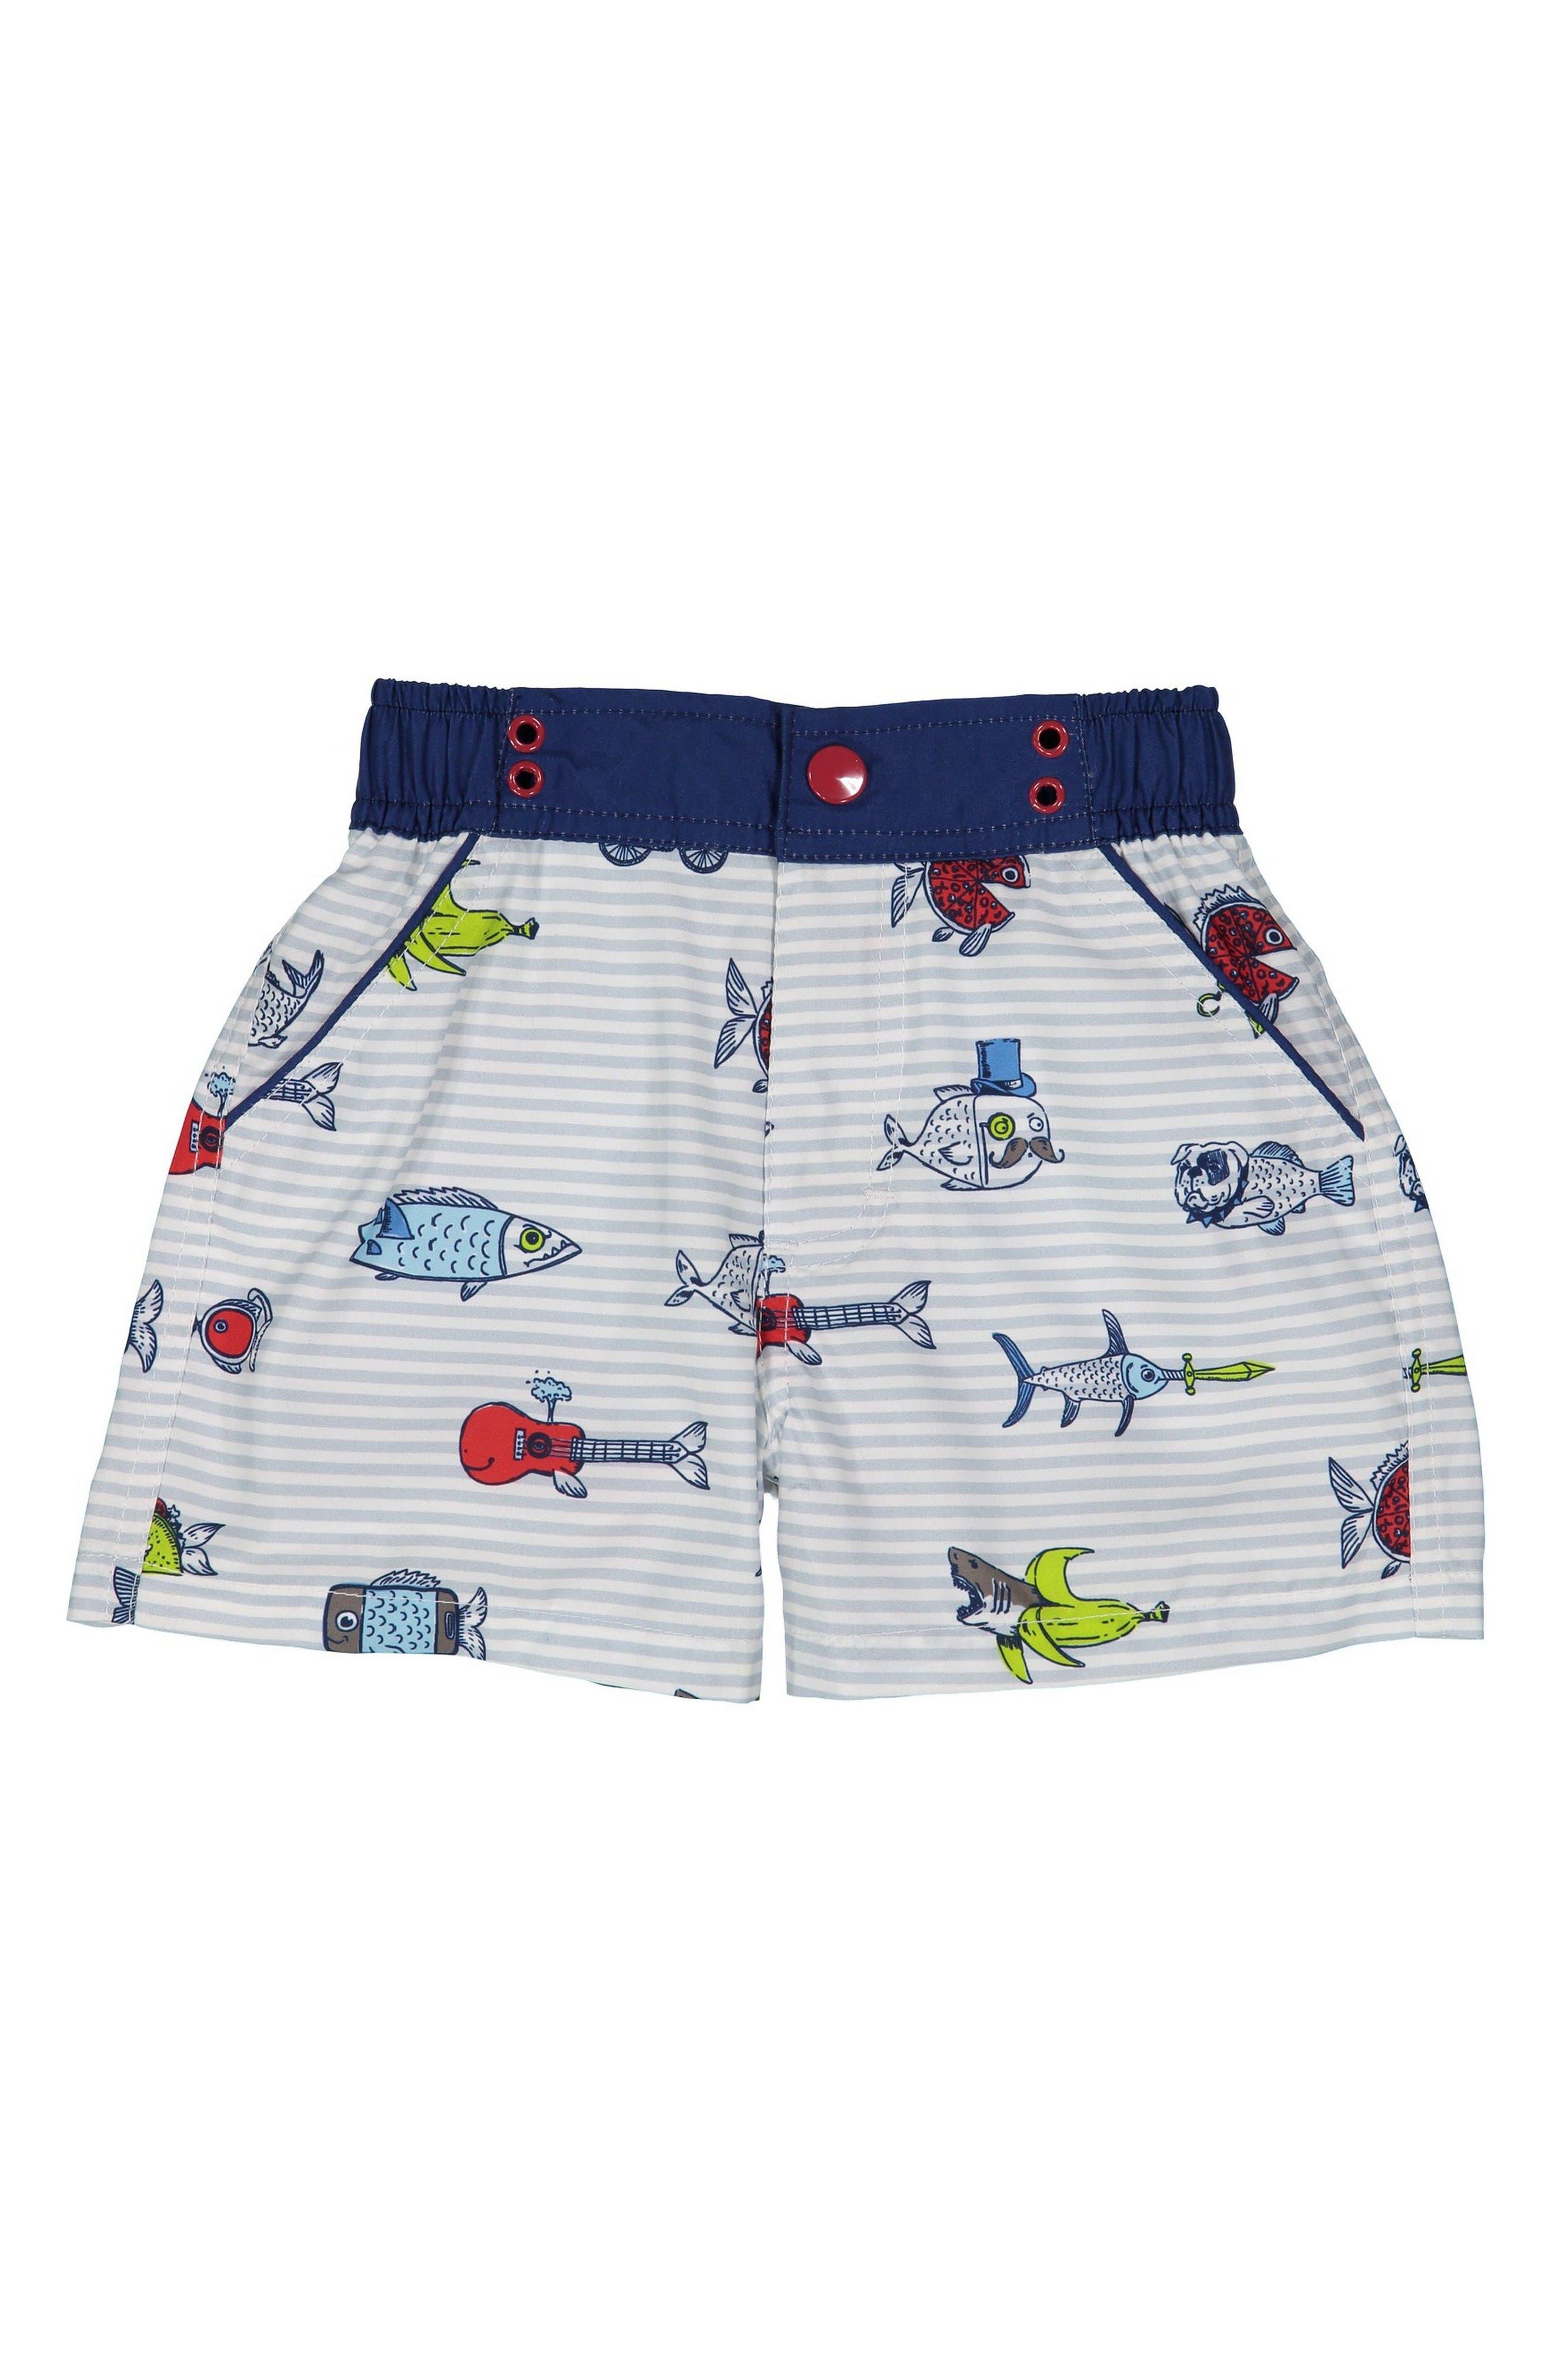 Alternate Image 1 Selected - Andy & Evan Fish Swim Trunks (Toddler Boys & Little Boys)